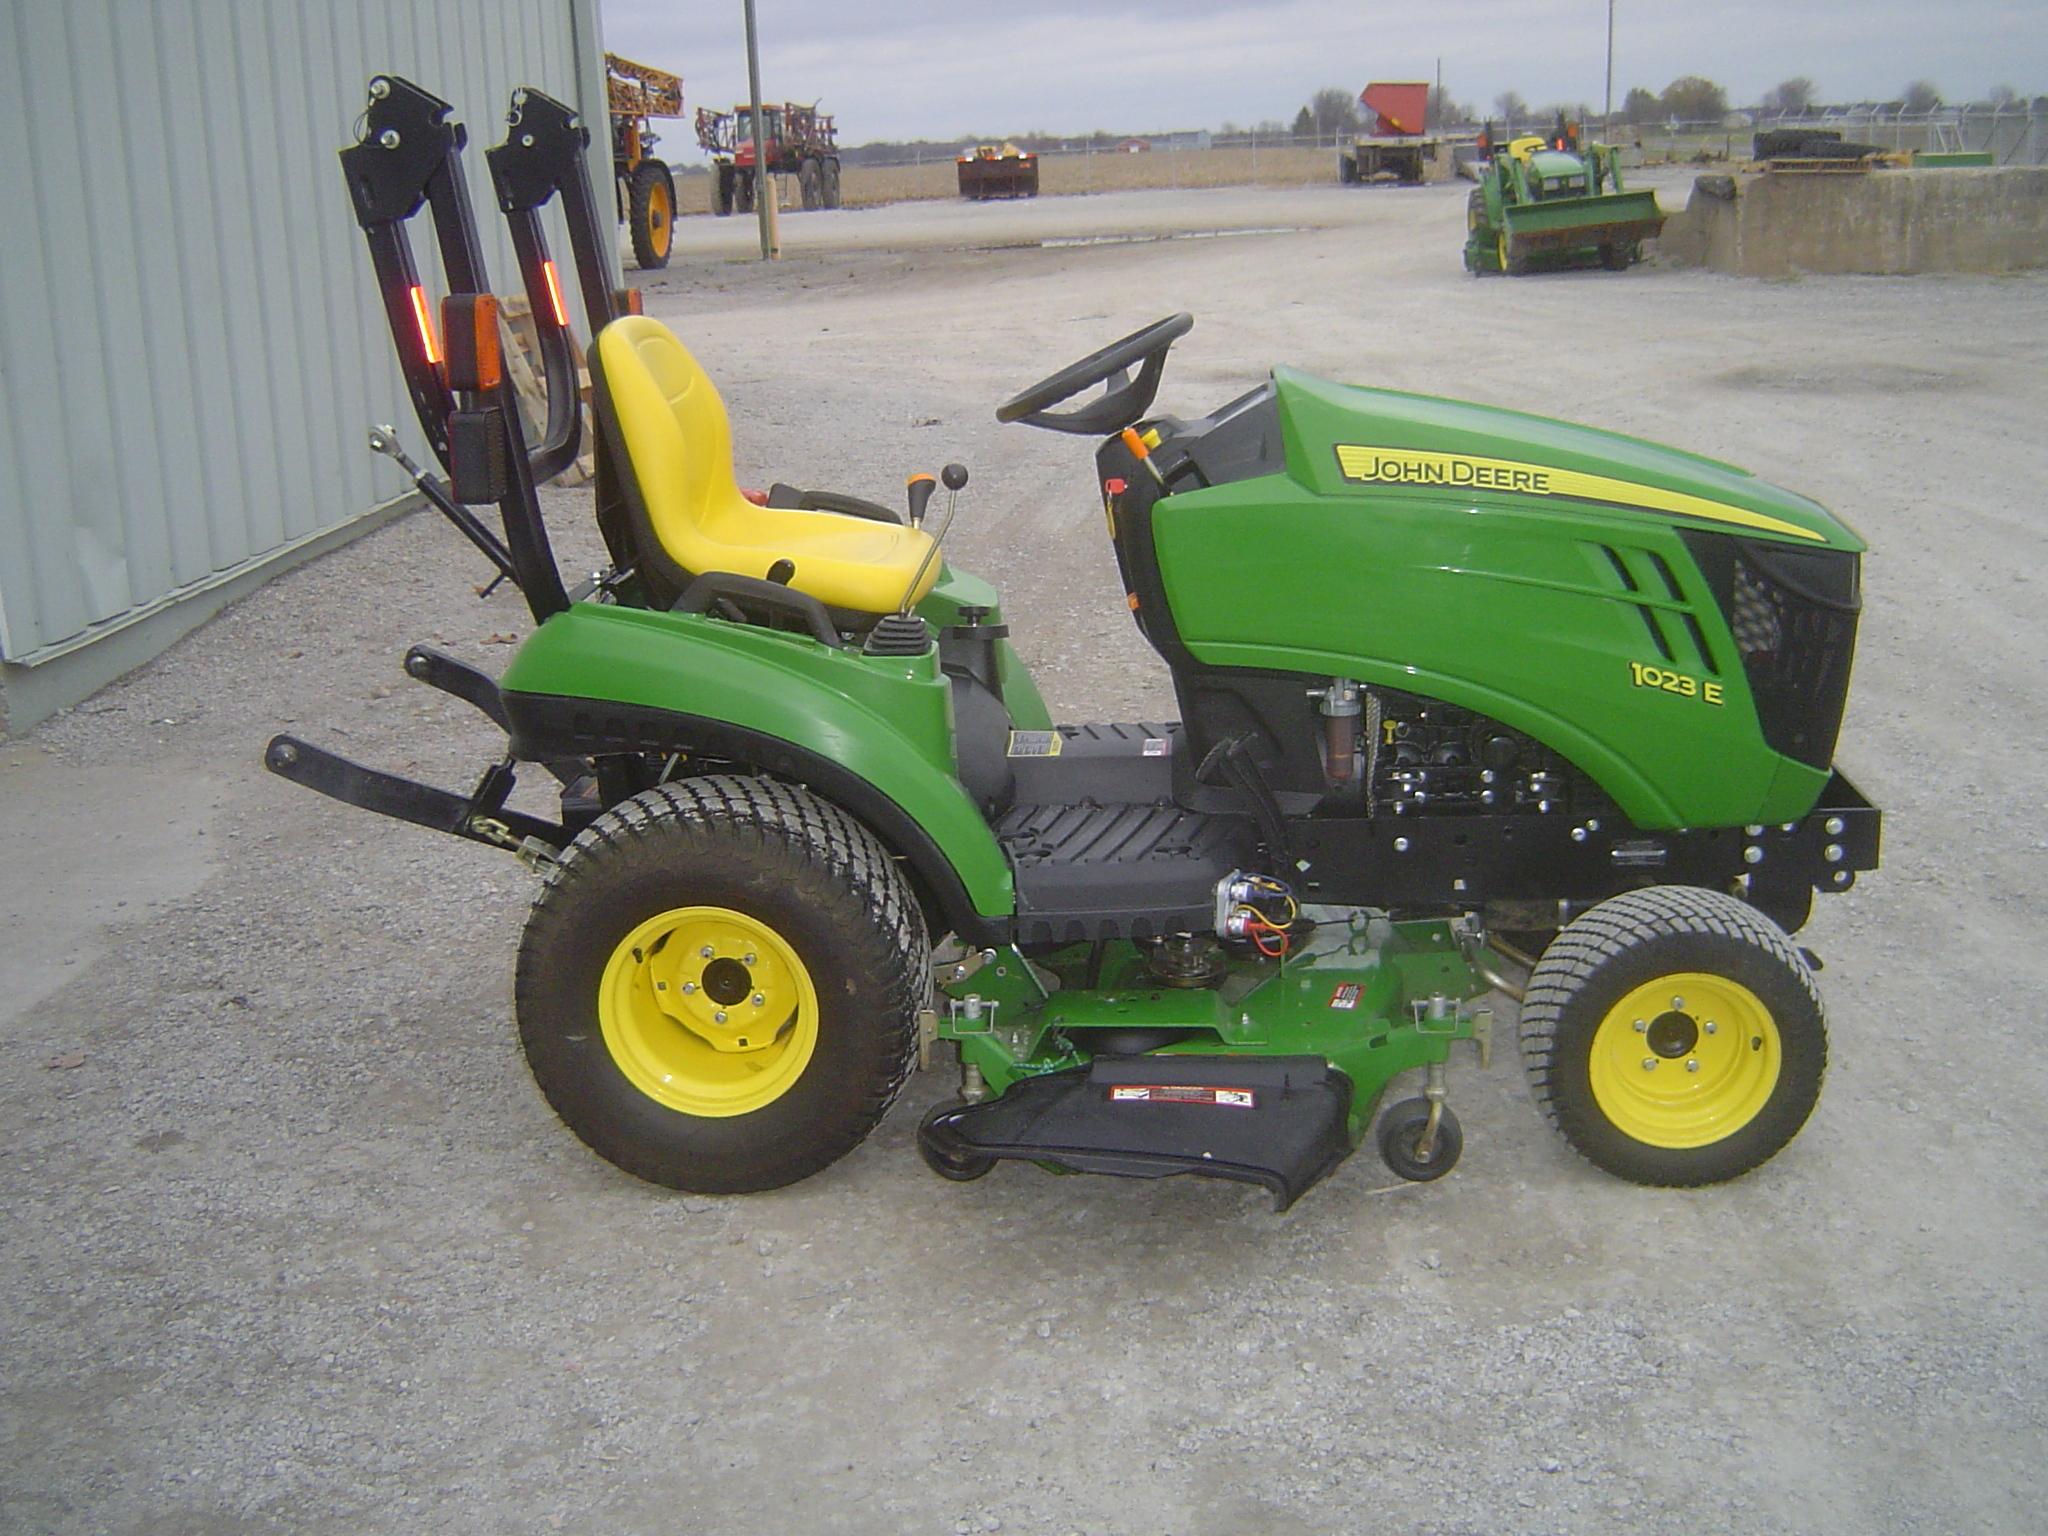 John Deere Compact Tractor Attachments : John deere e compact utility tractors for sale